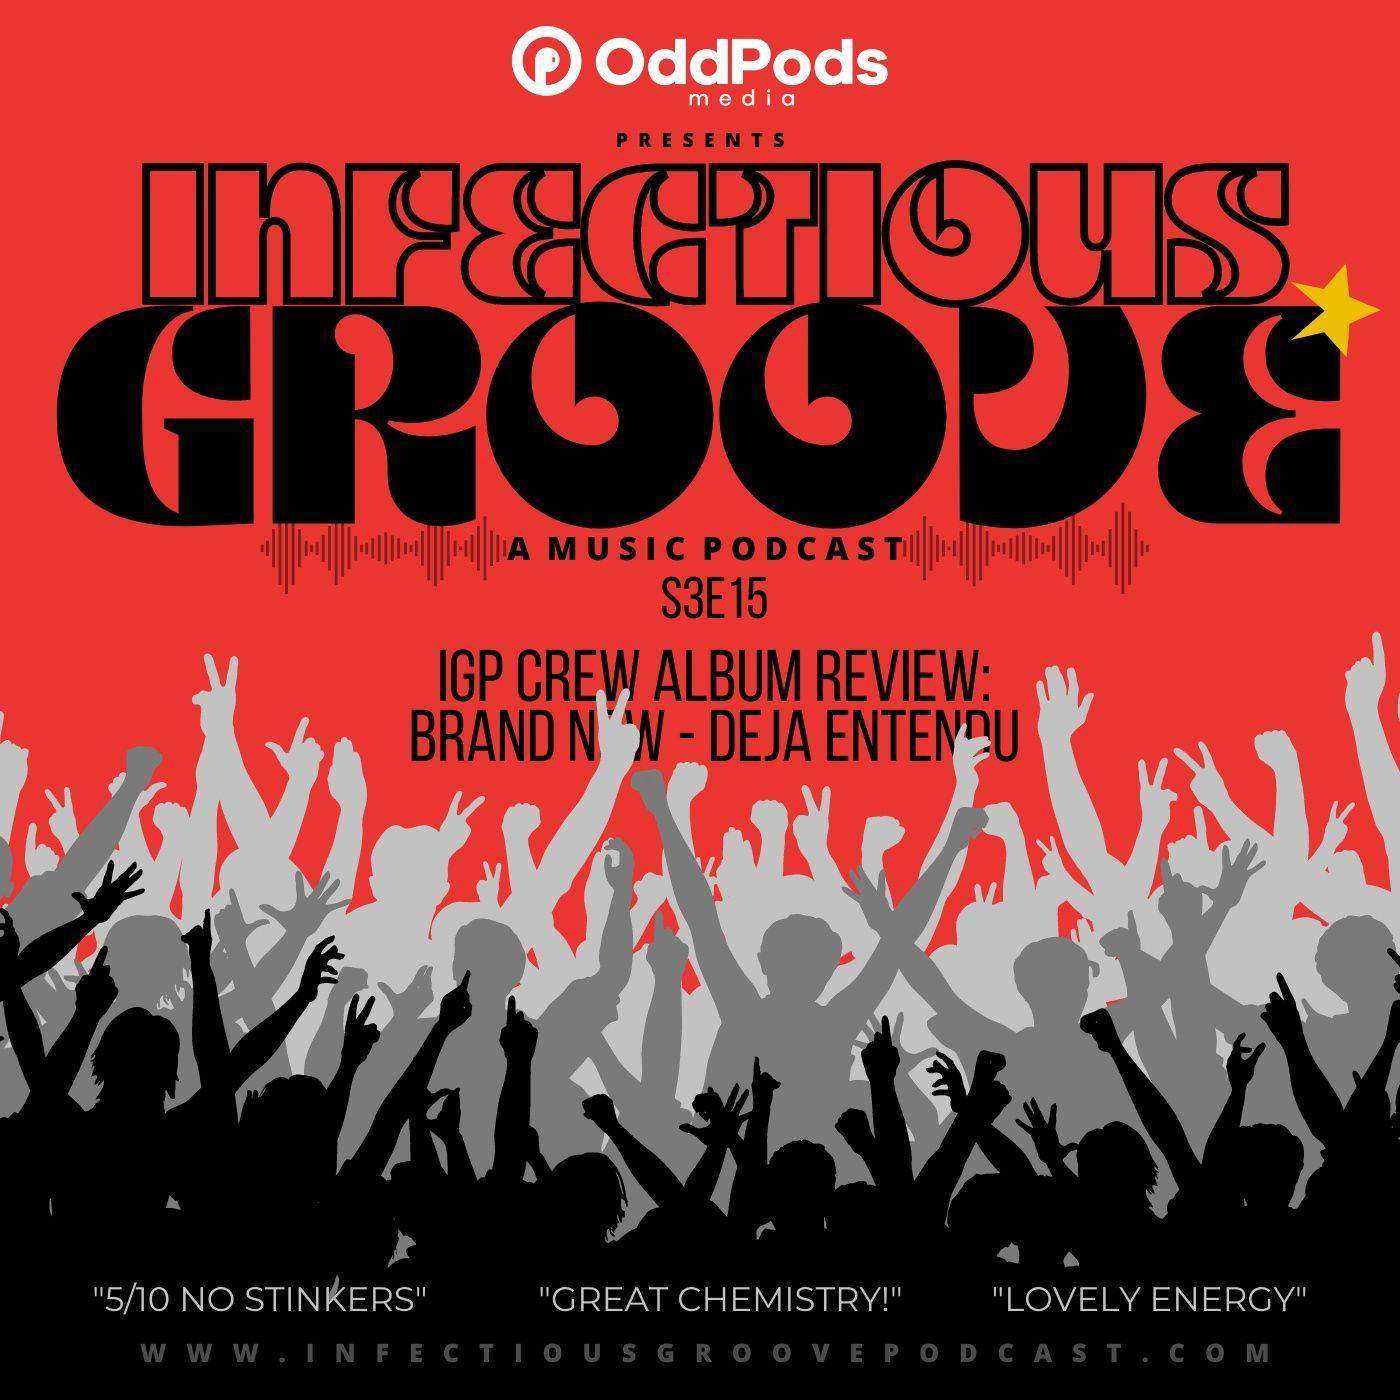 IGP Crew Album Review: Brand New - Deja Entendu